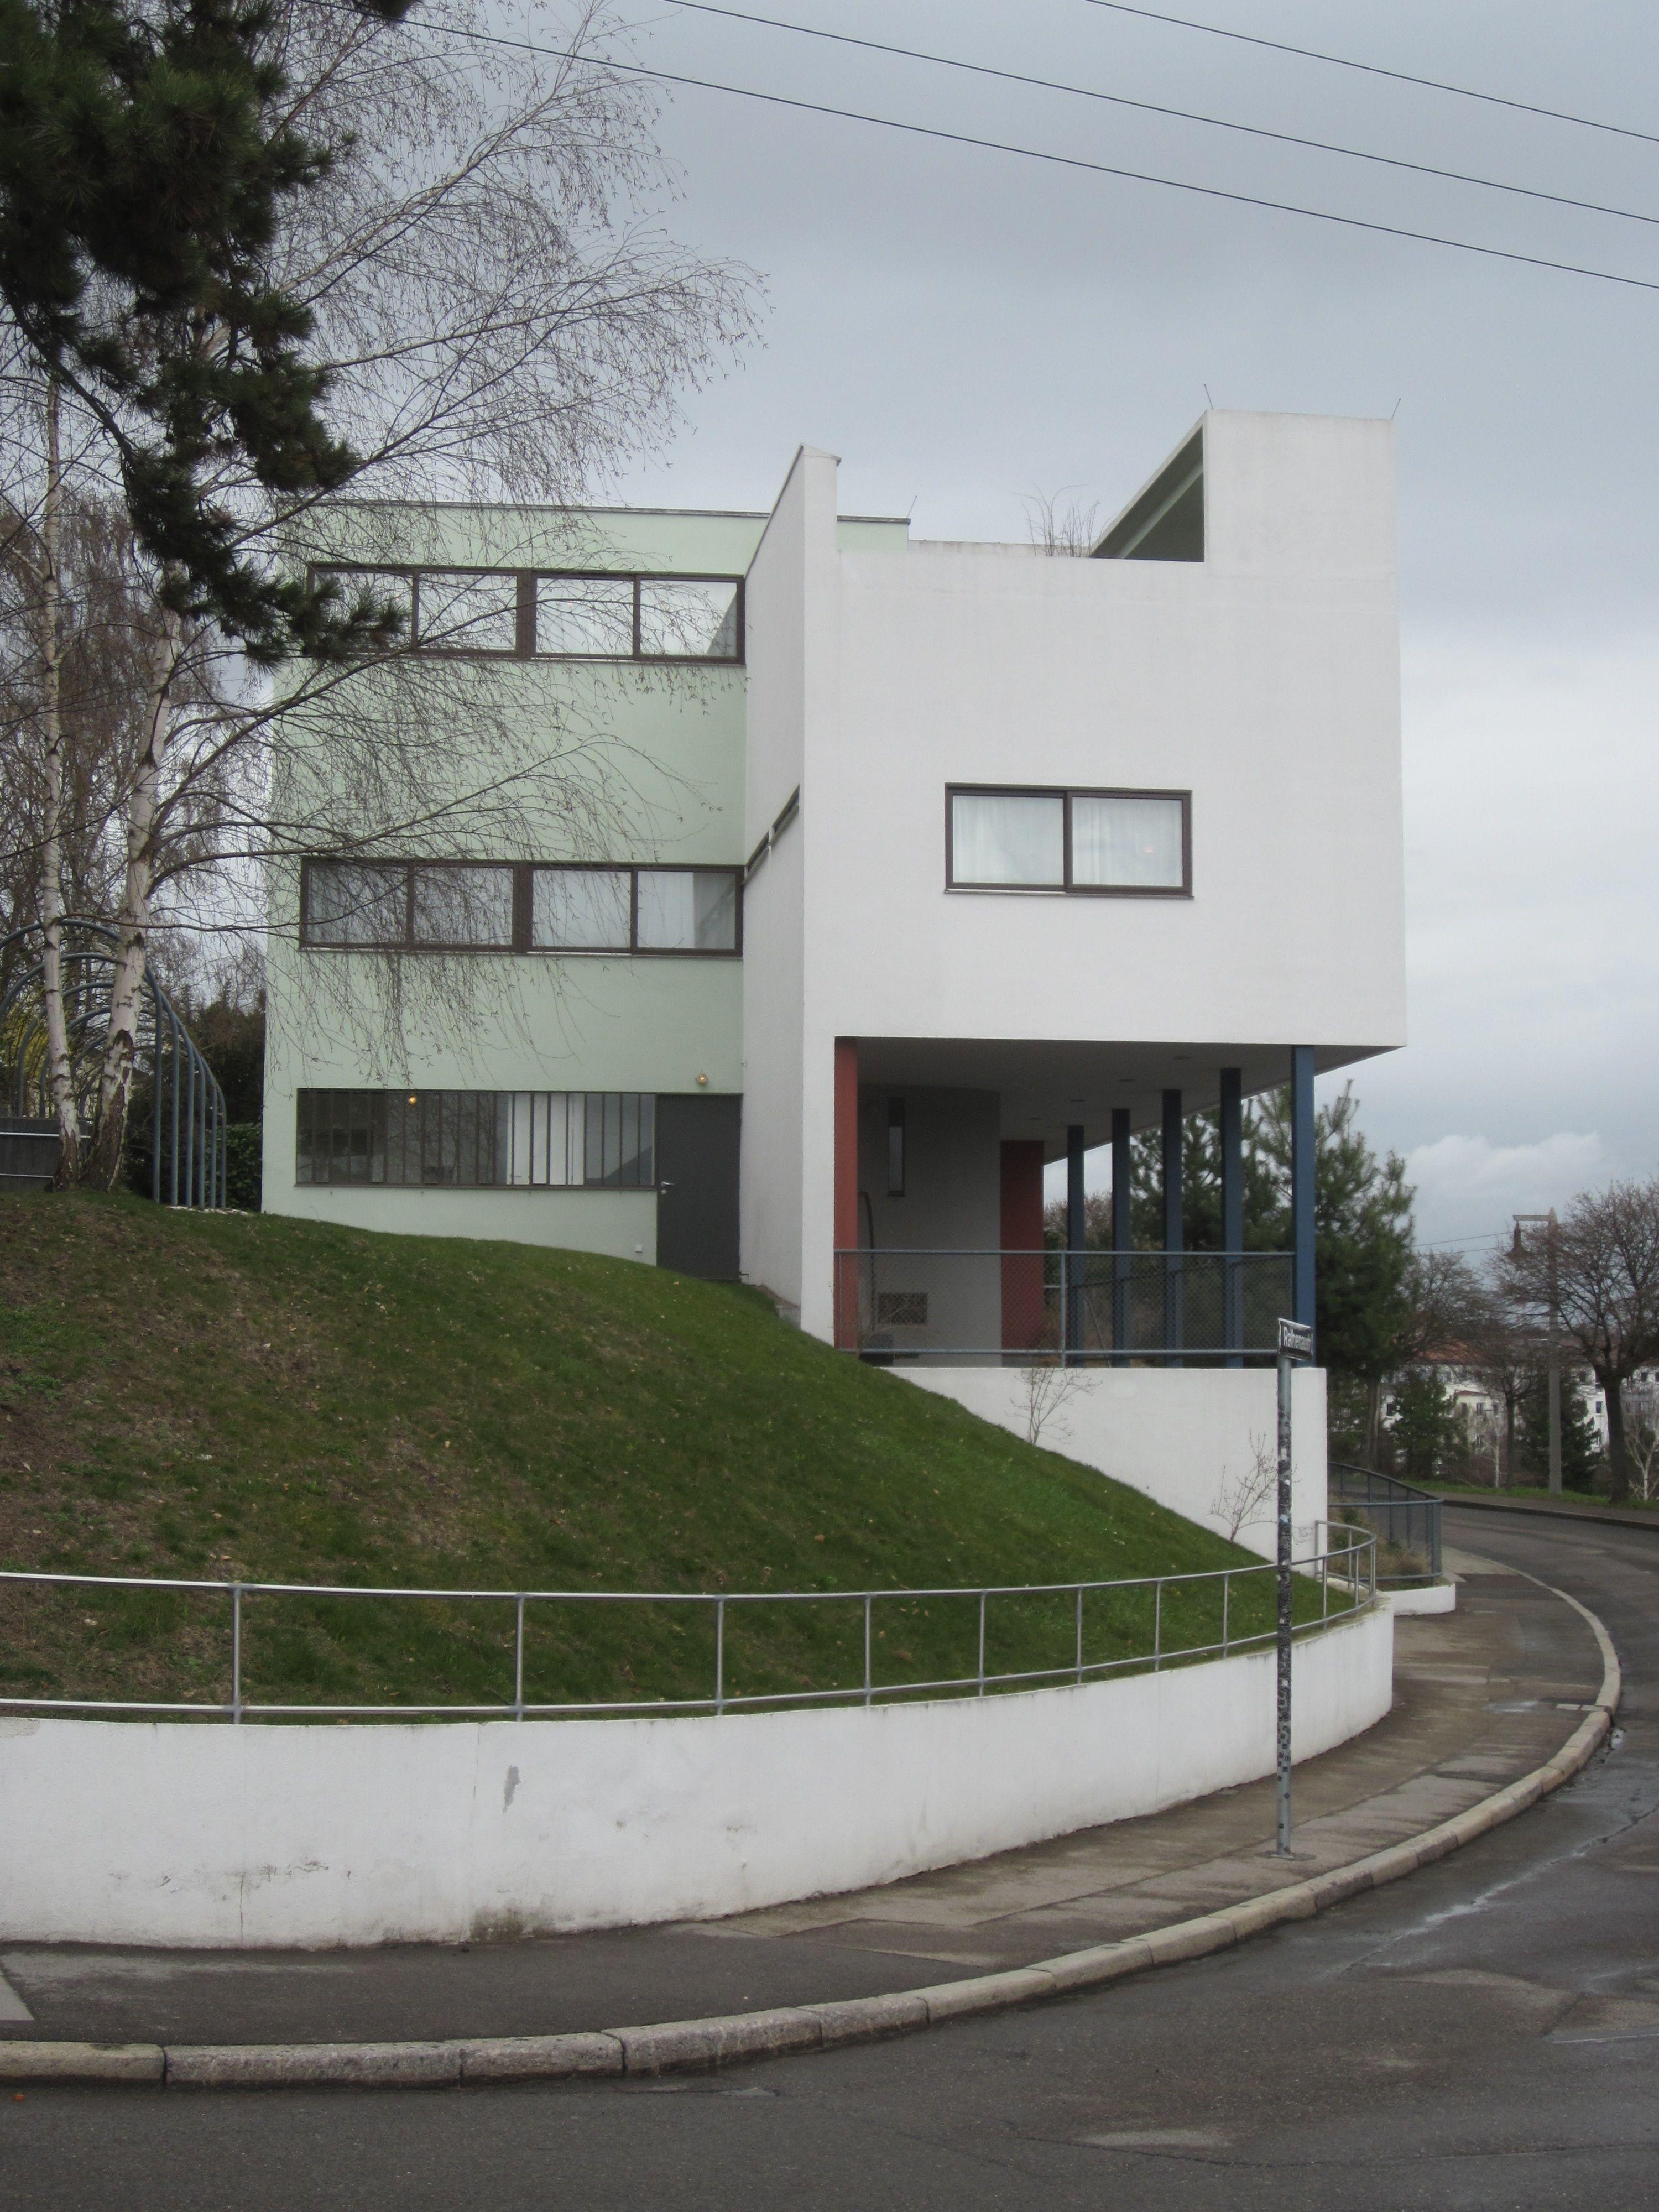 le corbusier weissenhof estate bauhaus architecture stuttgart photo by tjerk meijdam. Black Bedroom Furniture Sets. Home Design Ideas